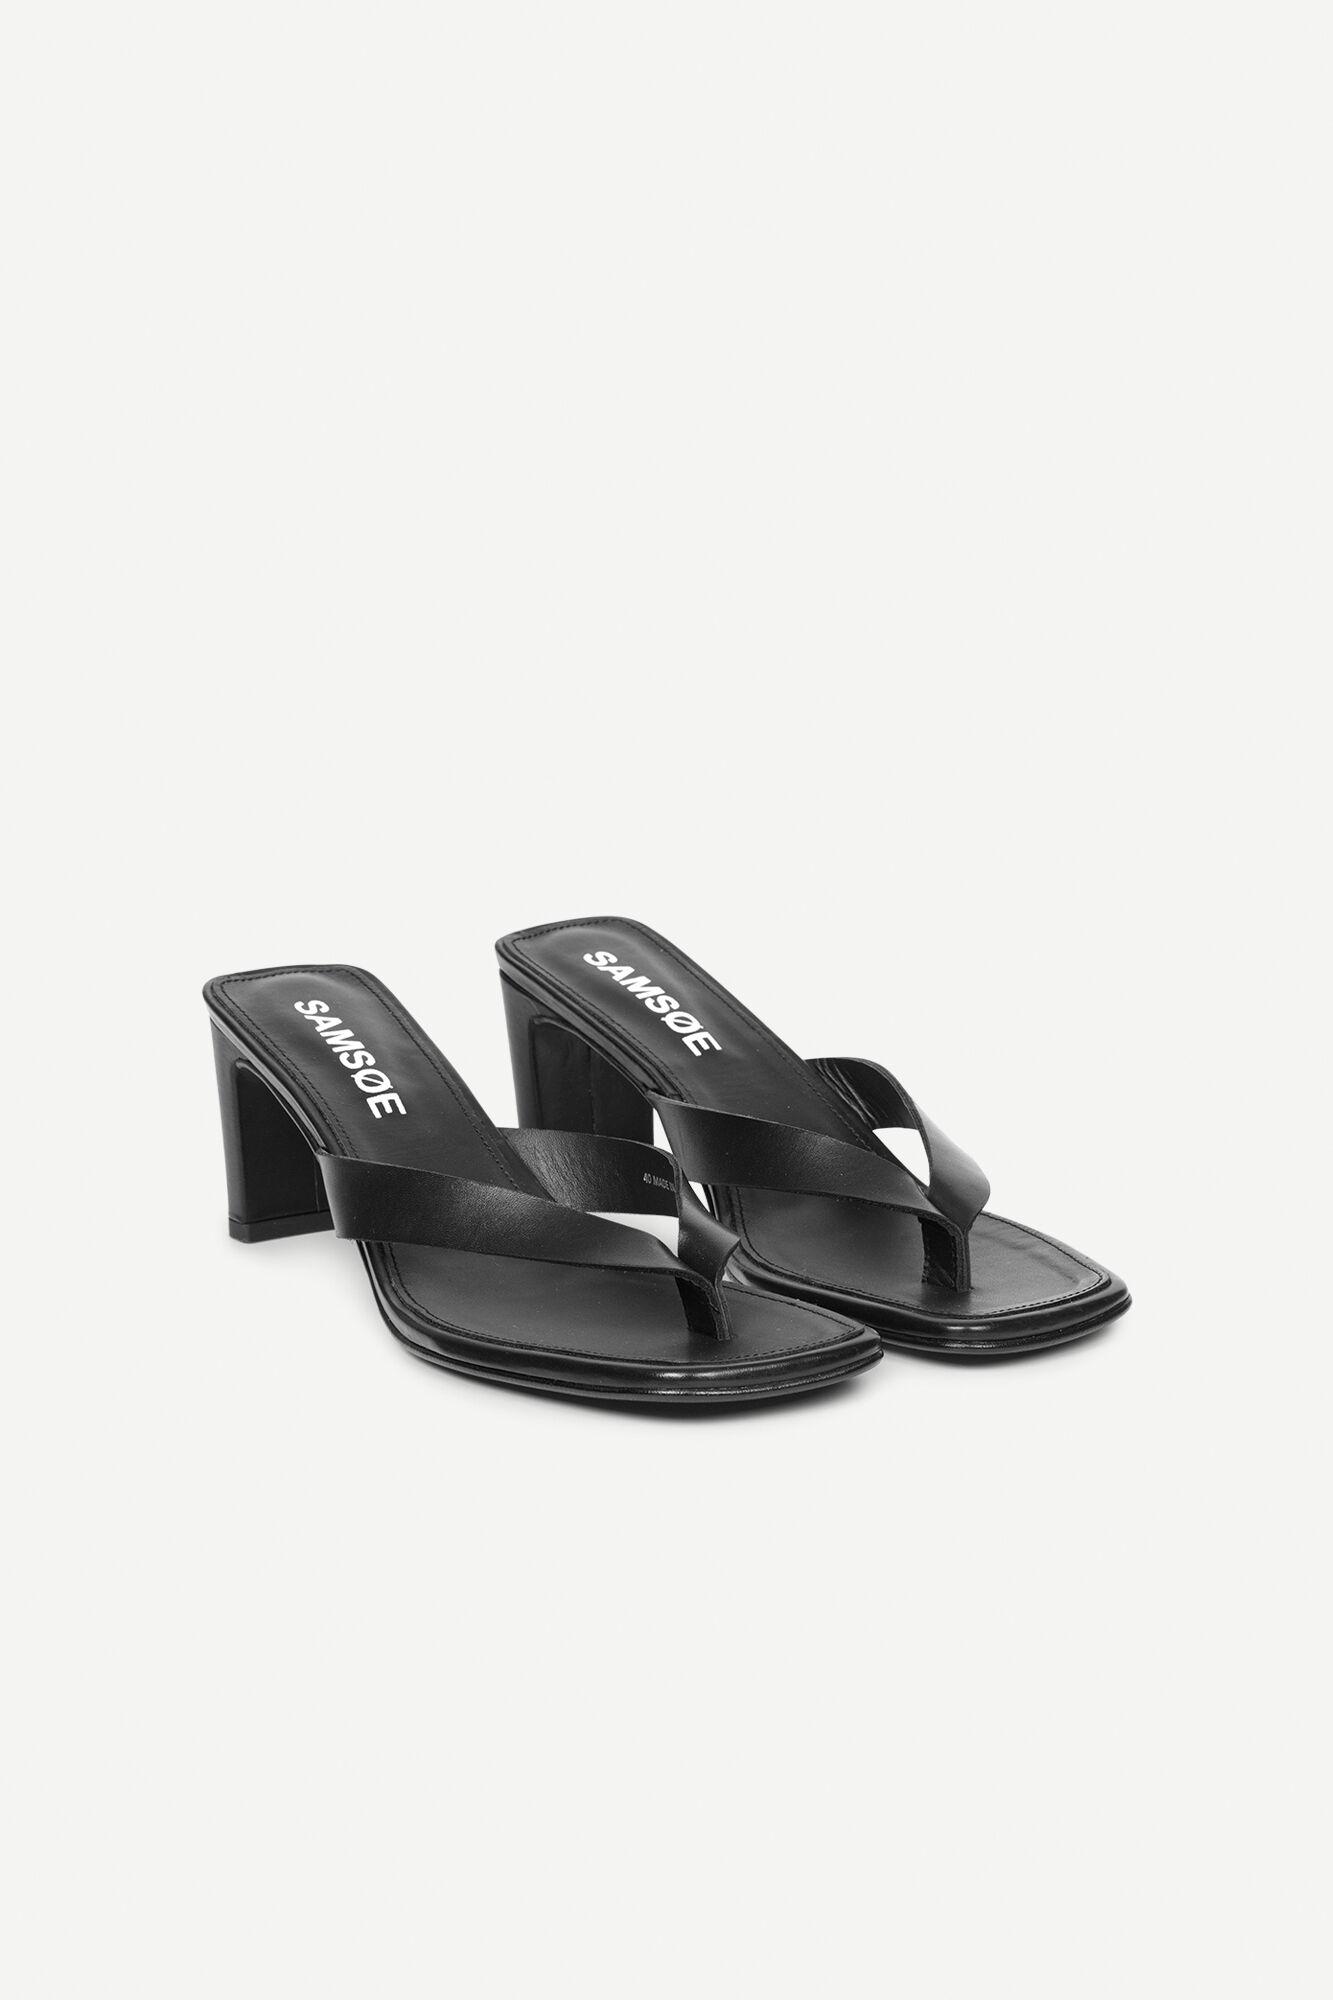 Brial sandal 11399, BLACK